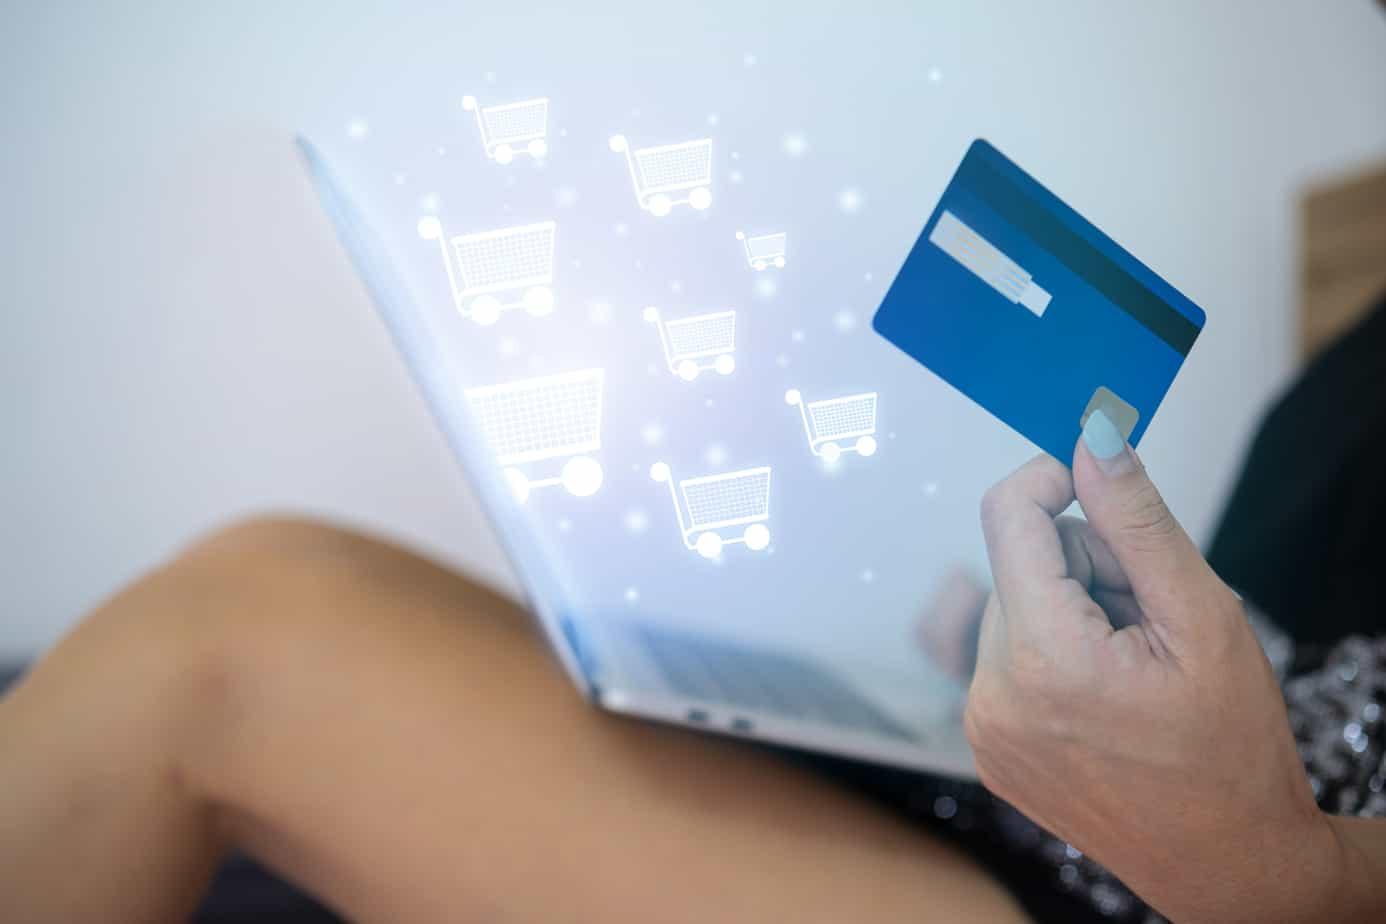 online shopping website on laptop easy e commerce website shop by laptop 195723616